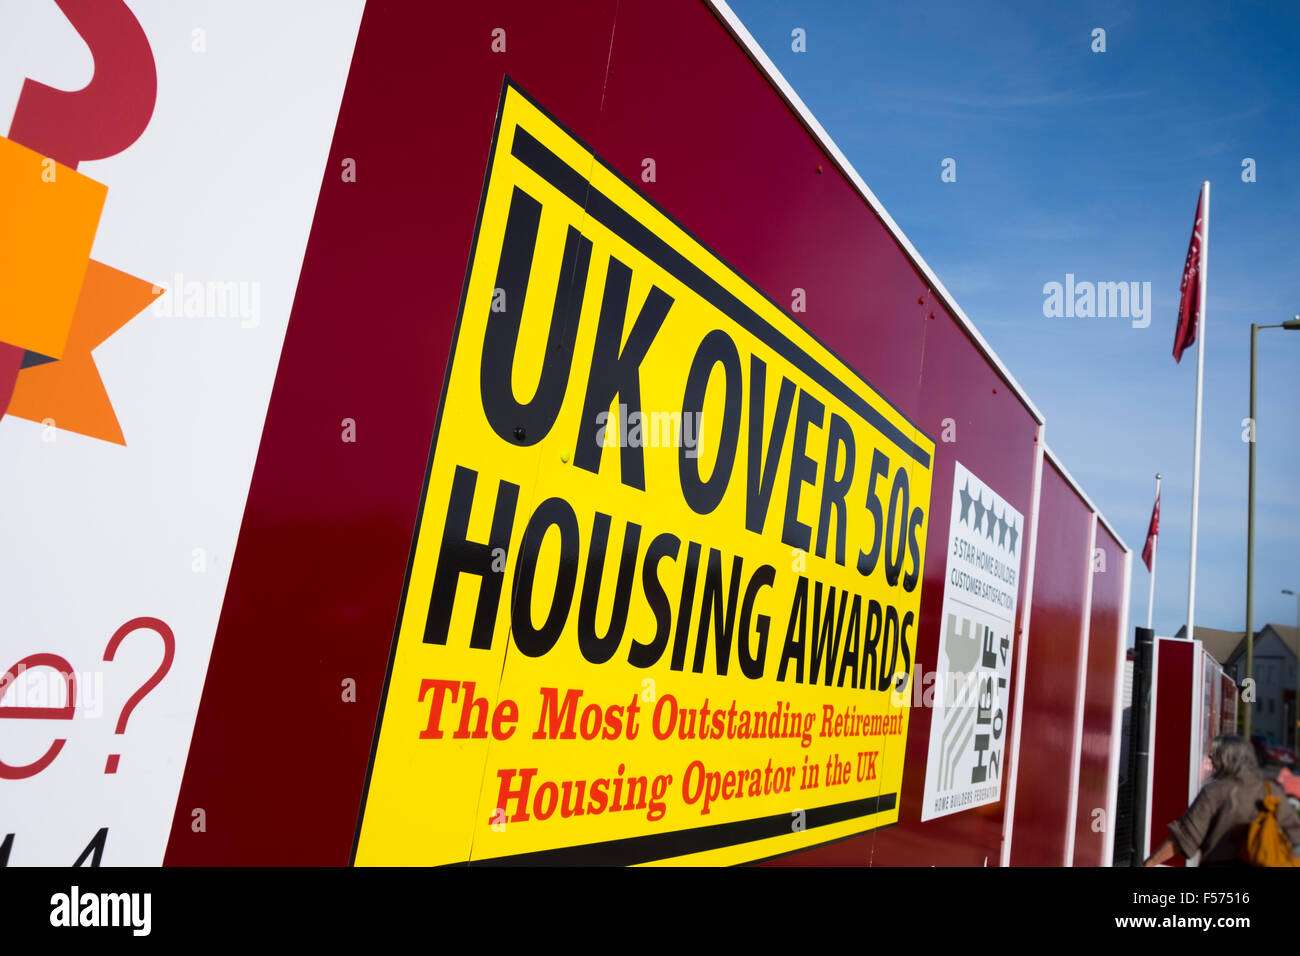 Billboard promoting UK over 50's Housing Awards on new development - Stock Image